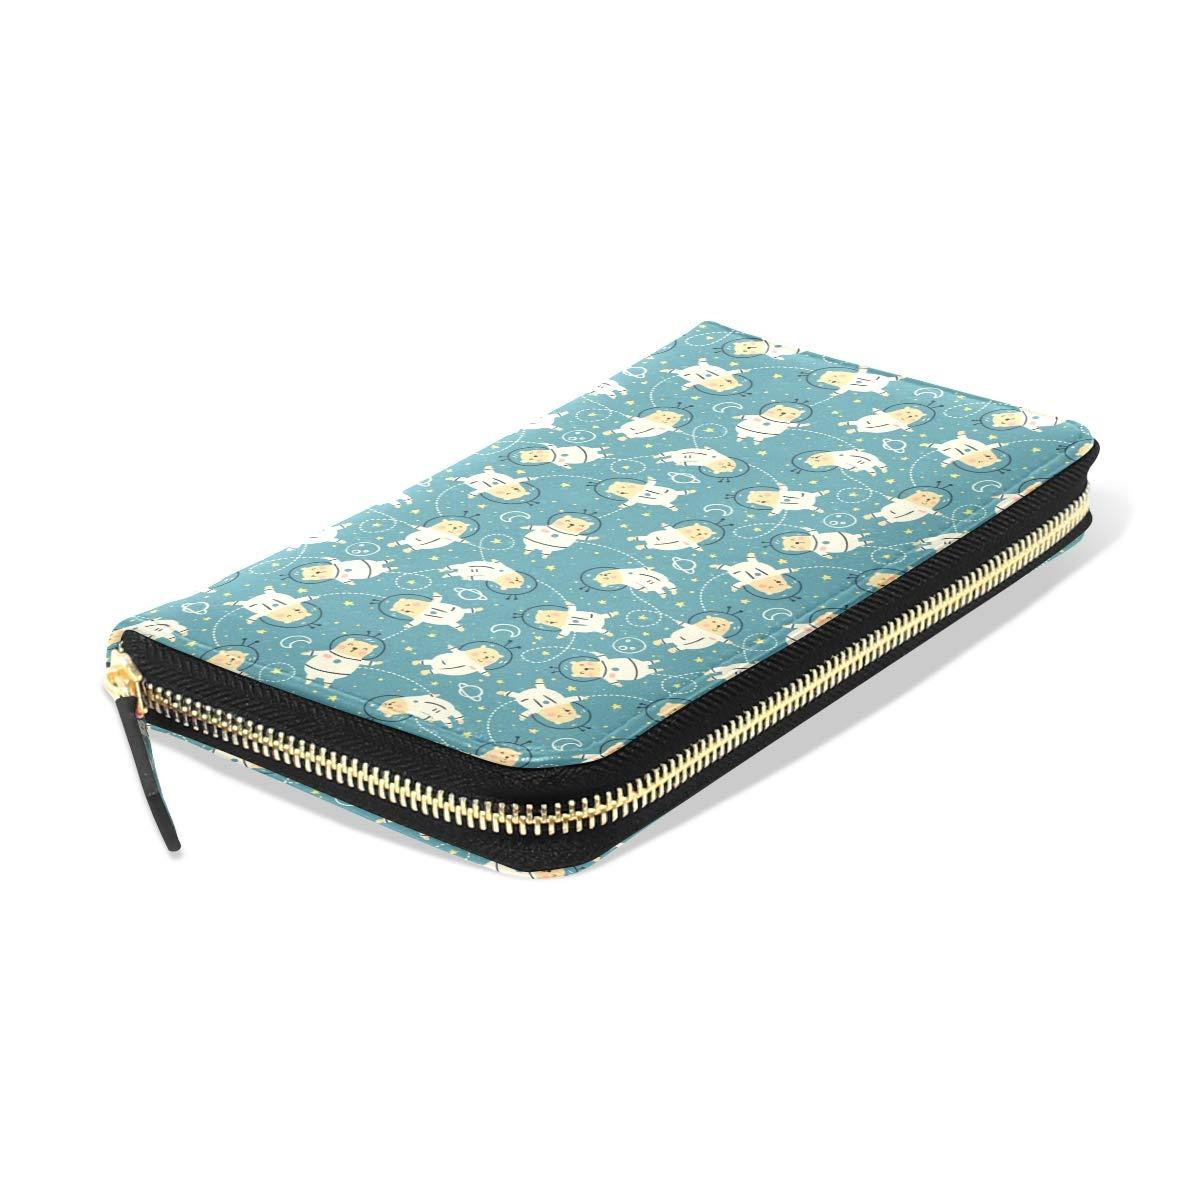 Women Cute Bear Stronauts Blue Leather Wallet Large Capacity Zipper Travel Wristlet Bags Clutch Cellphone Bag